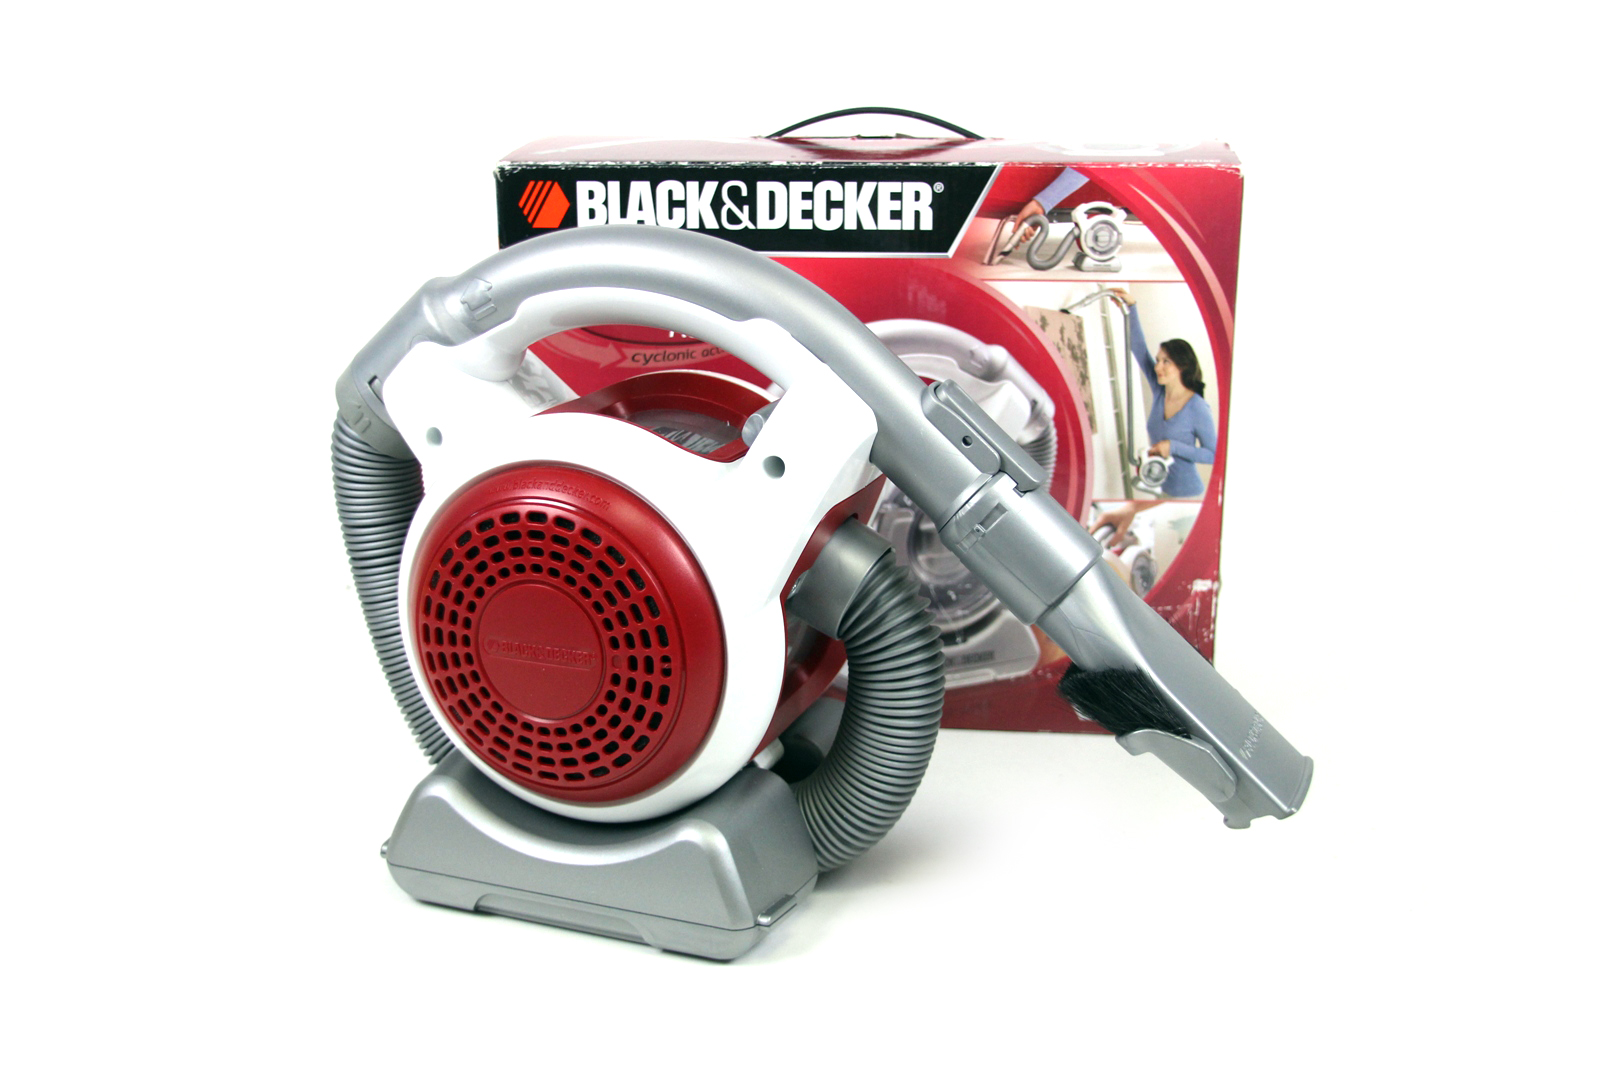 black decker dustbuster flexi pd1080 akku handstaubsauger cyclon handsauger ebay. Black Bedroom Furniture Sets. Home Design Ideas